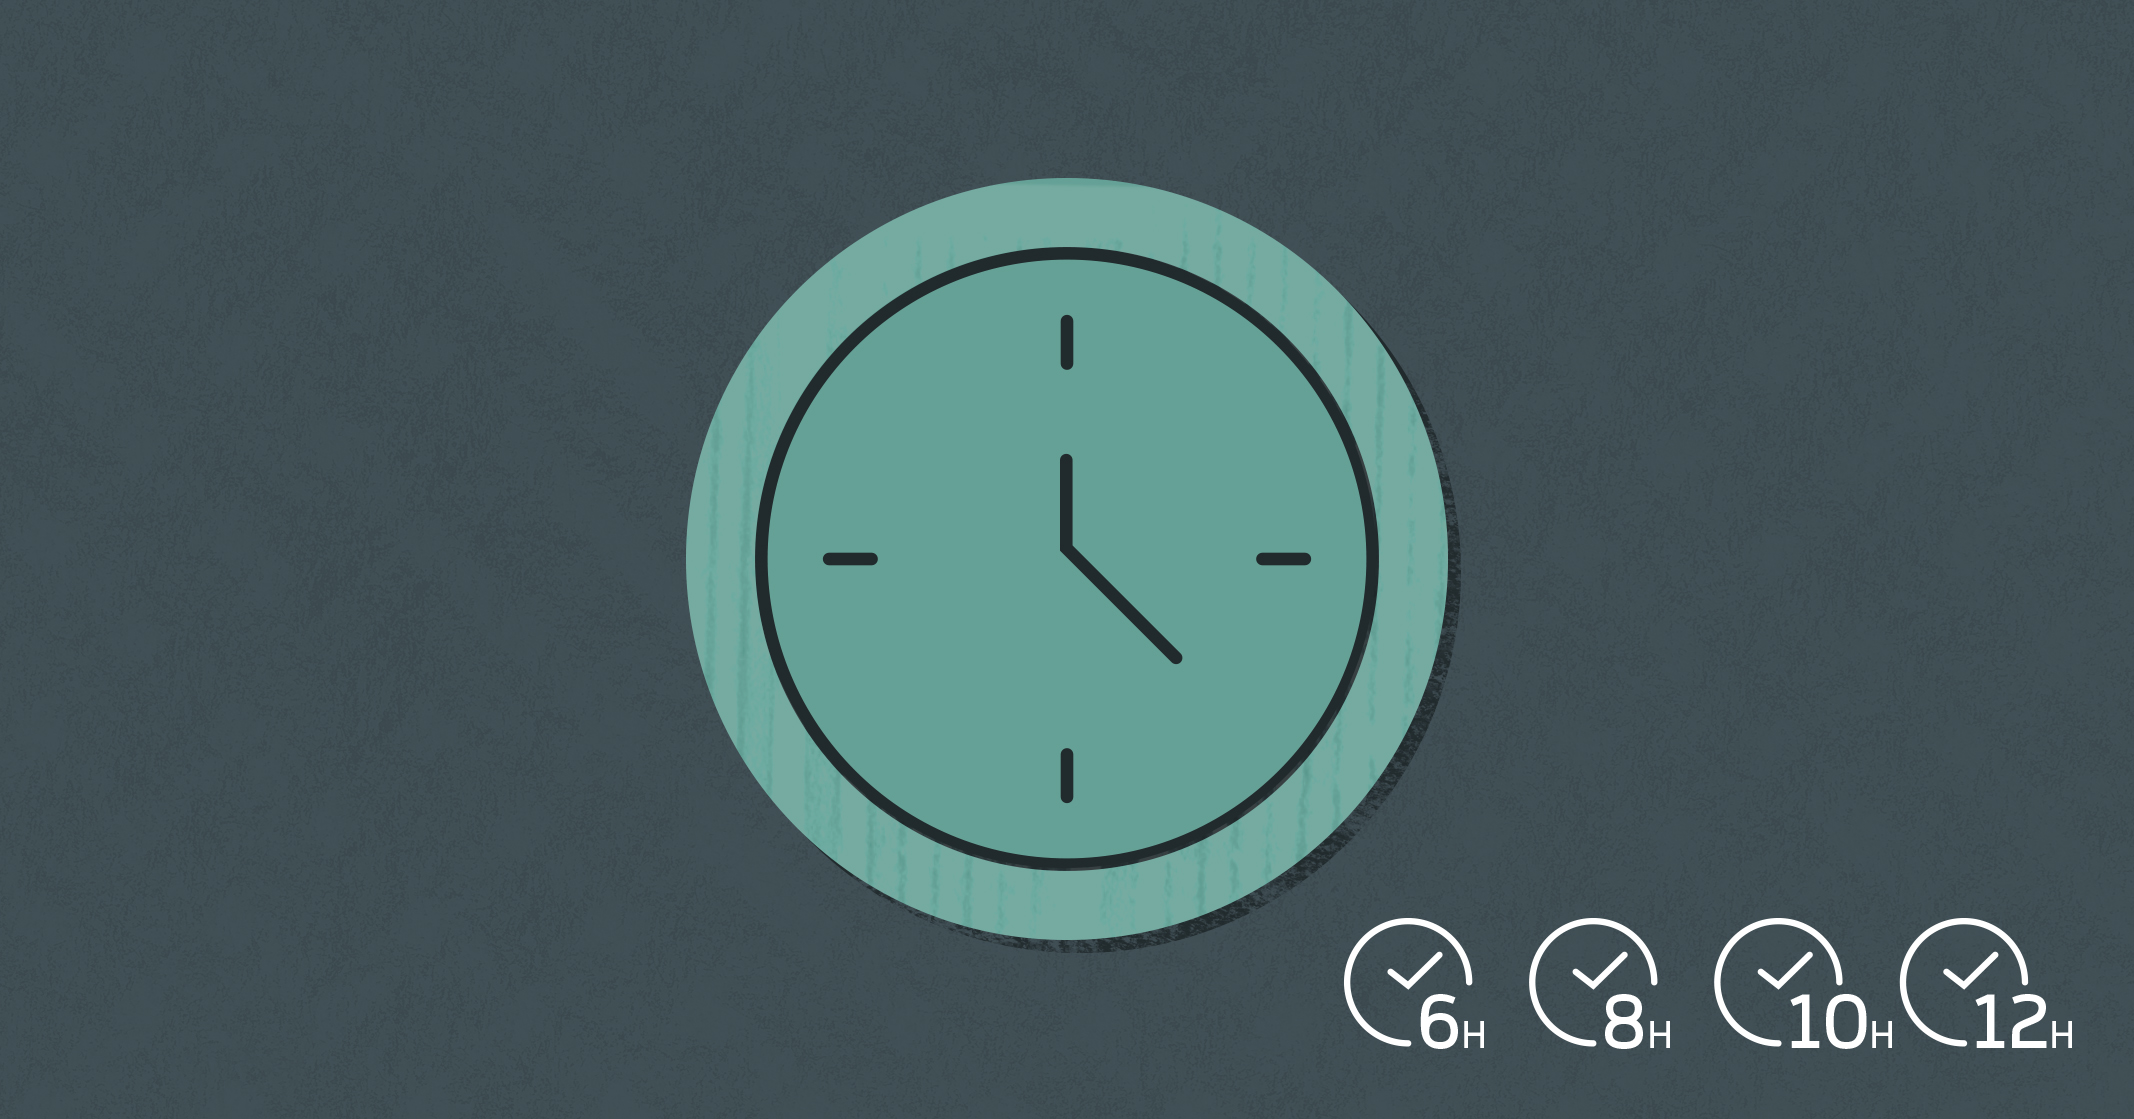 cp008_tempo_8.jpg.jpg